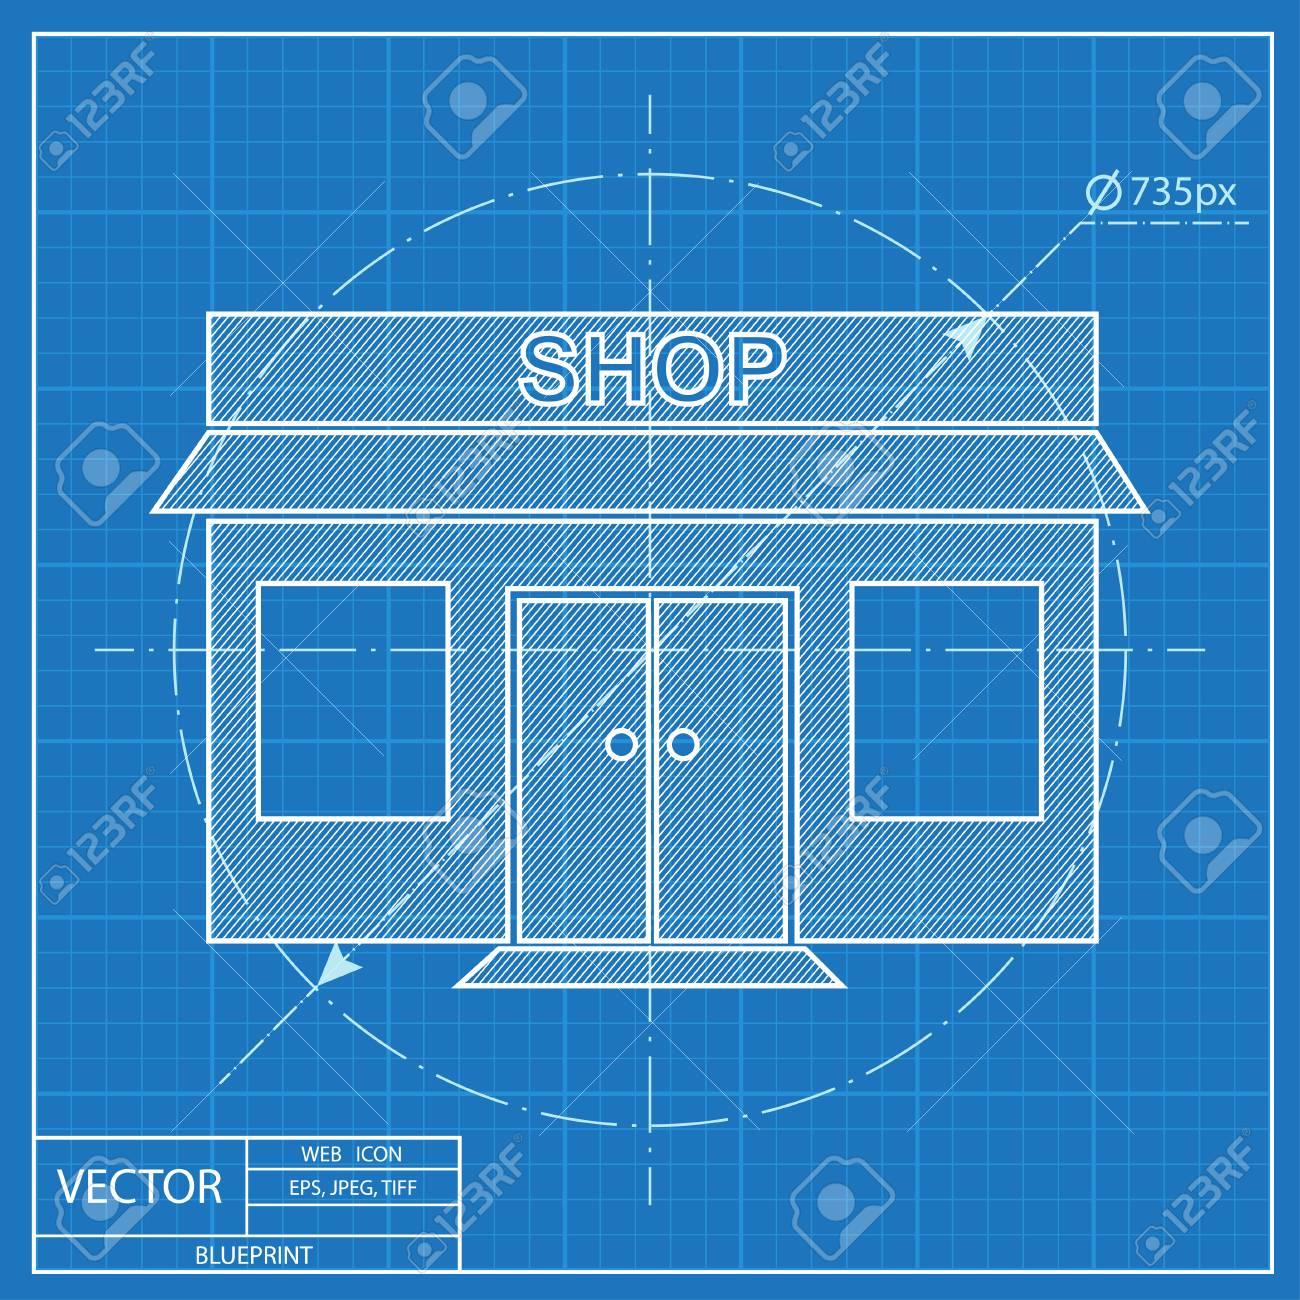 Shop icon blueprint style royalty free cliparts vectors and stock shop icon blueprint style stock vector 55573789 malvernweather Choice Image